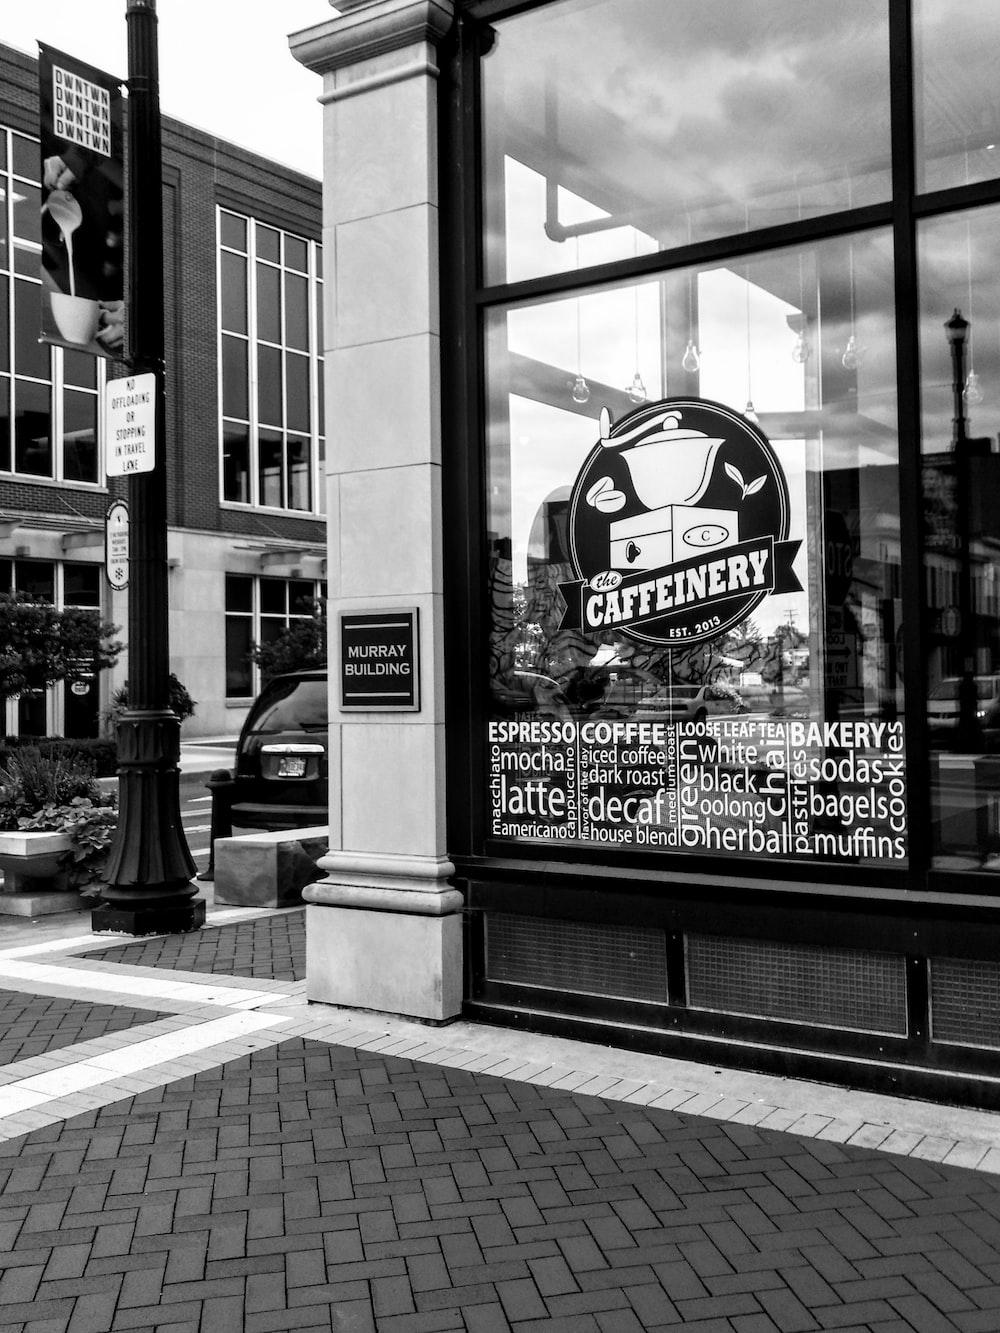 Caffeinery store facade